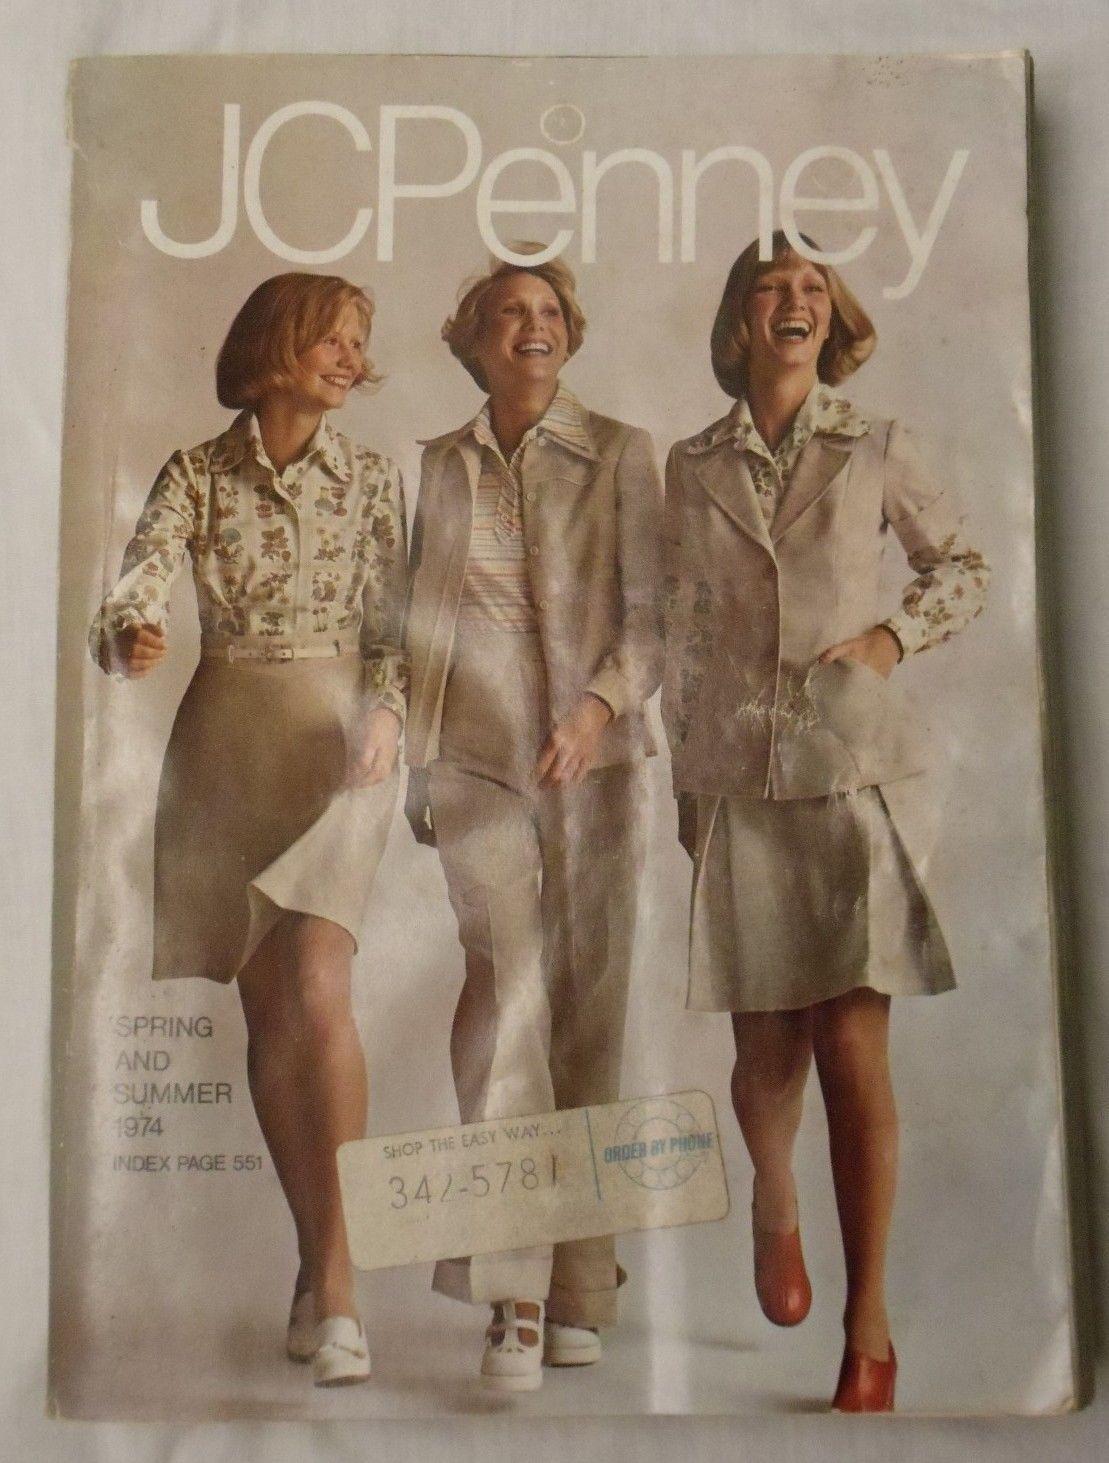 Vintage 1974 JCPenney Spring & Summer Catalog | JCPenney Memories ...